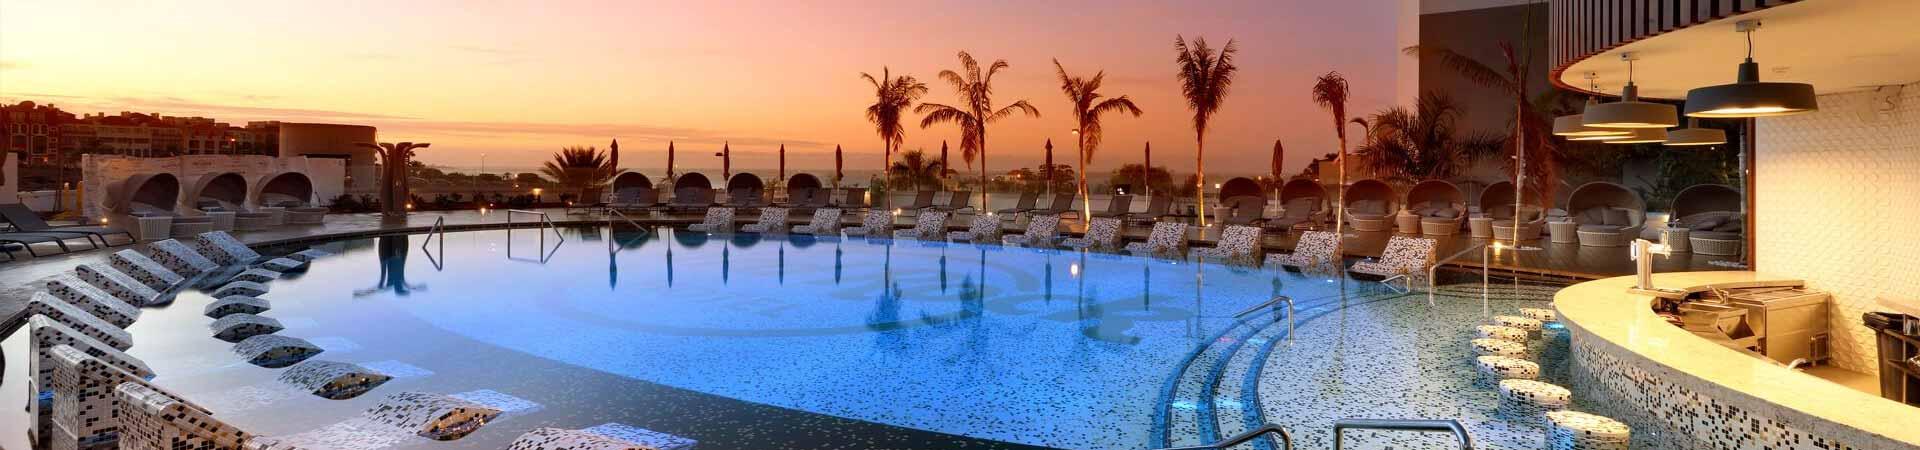 https://www.goodmorningtenerife.com/wp-content/uploads/2019/05/03_slide_hard-rock-hotel-tenerife-good-morning-tenerife-1950.jpg